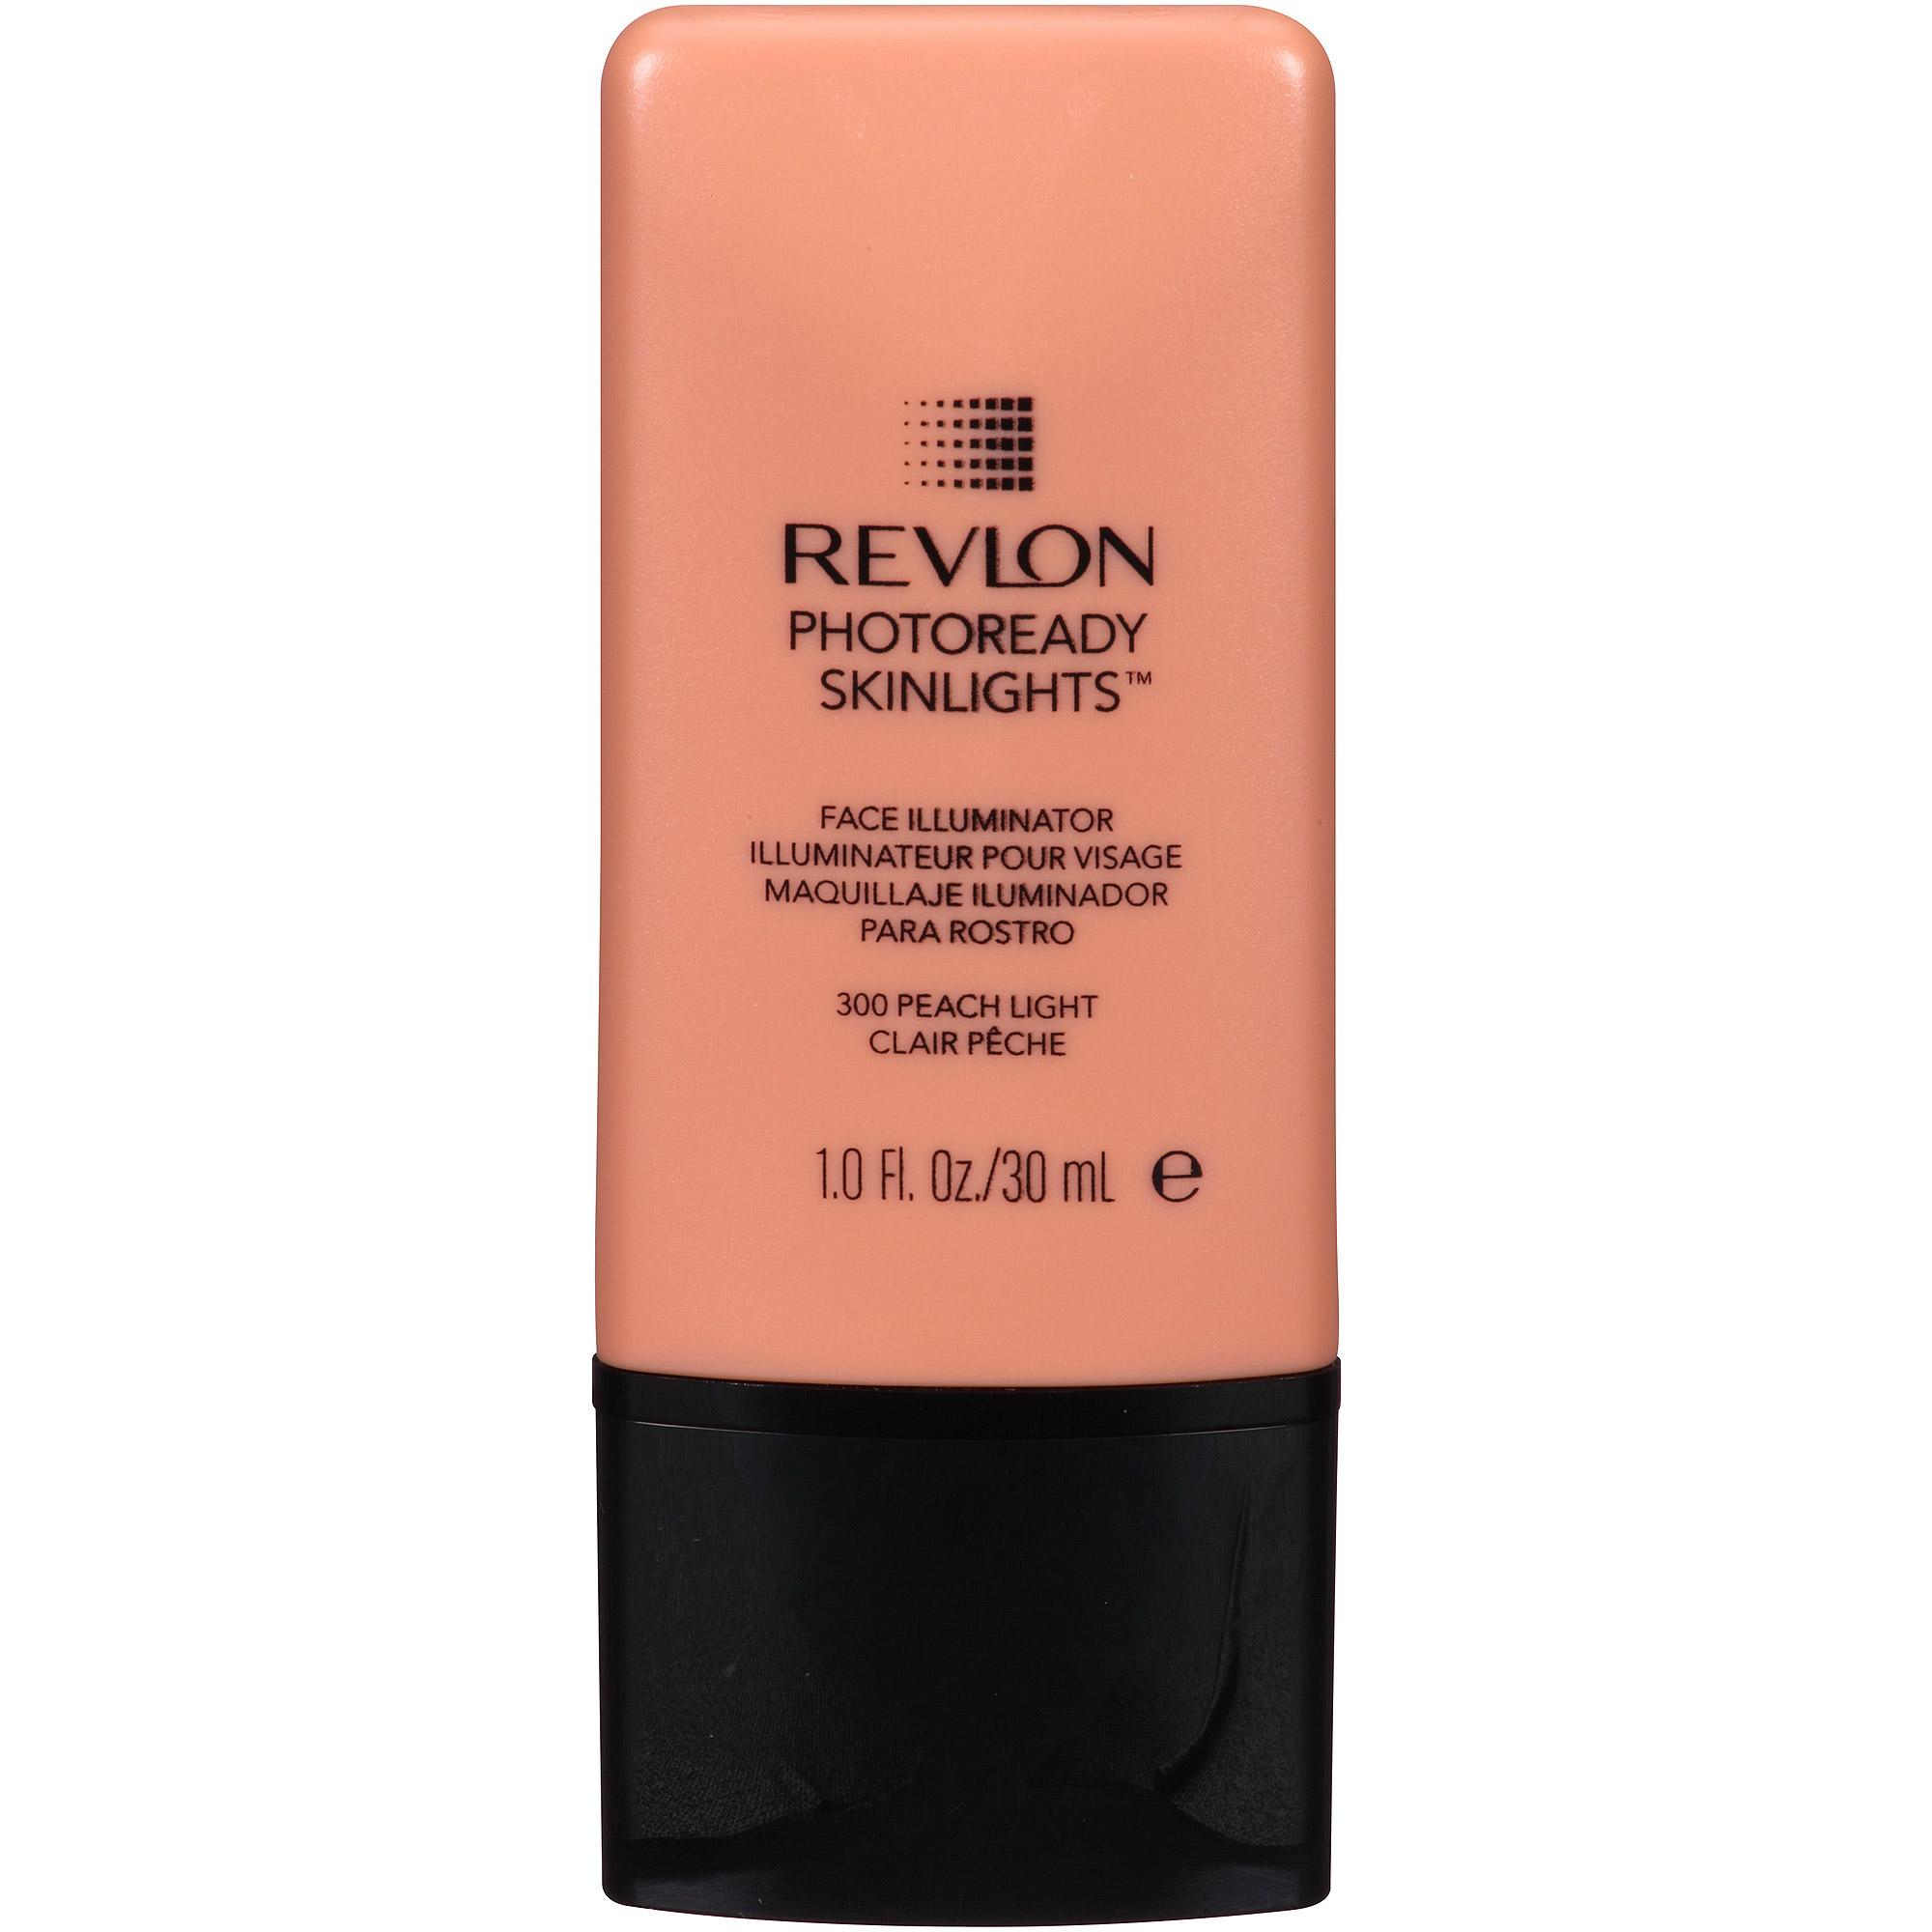 Revlon Photoready Skinlights Face Illuminator 300 Peach Light 1 Fl Oz.